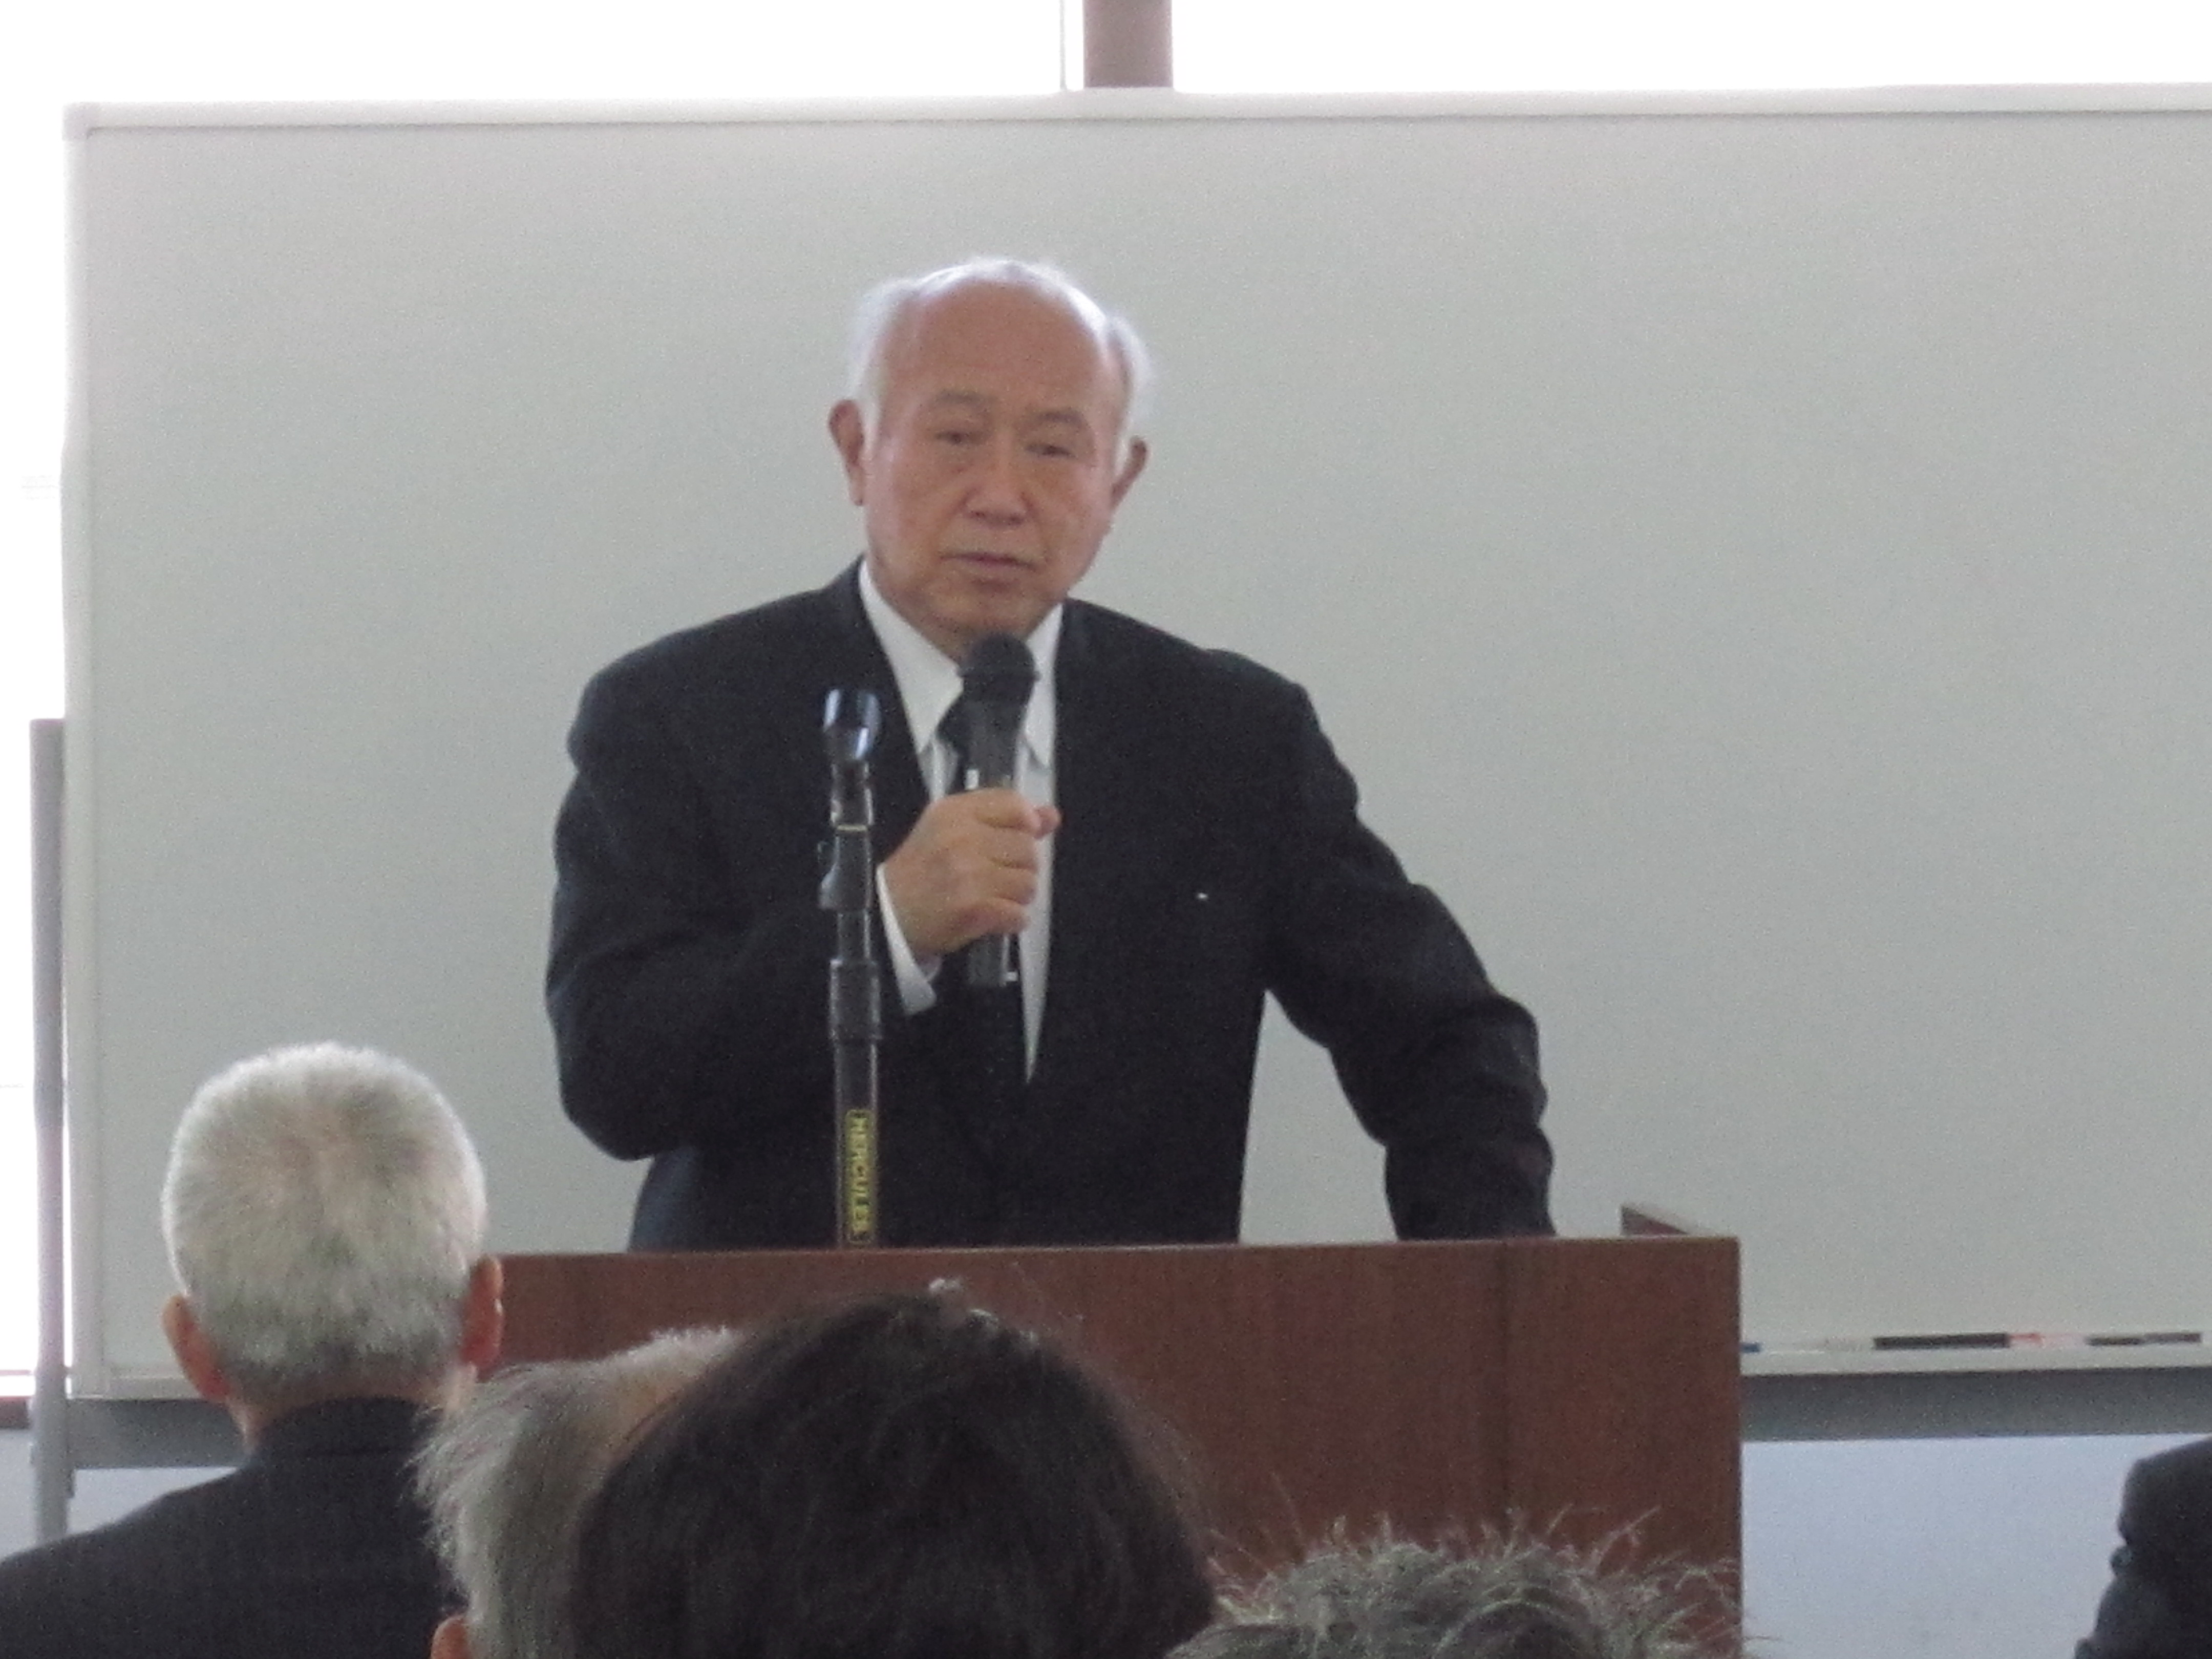 IMG 5602 - 4月1日東京思風塾の開催になります。